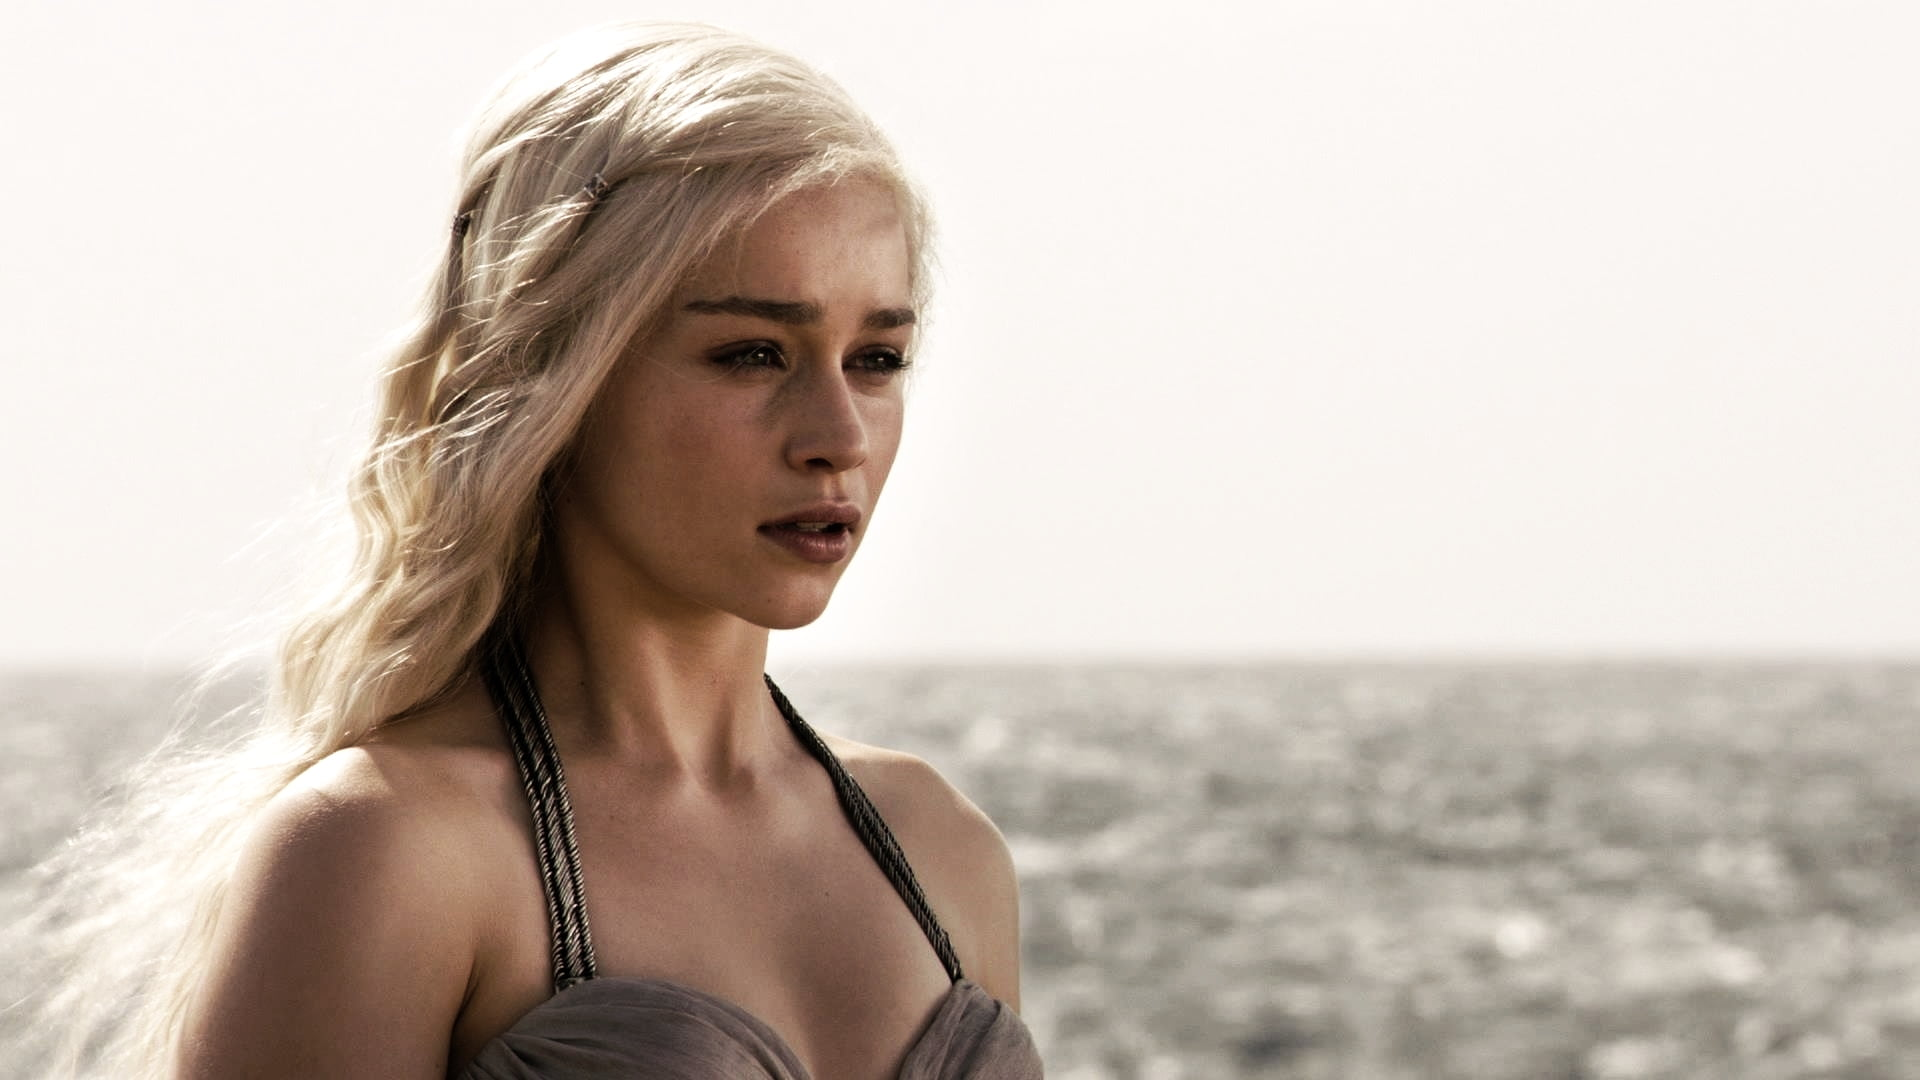 Game Of Thrones Daenerys Targaryen Beauty - HD Wallpaper